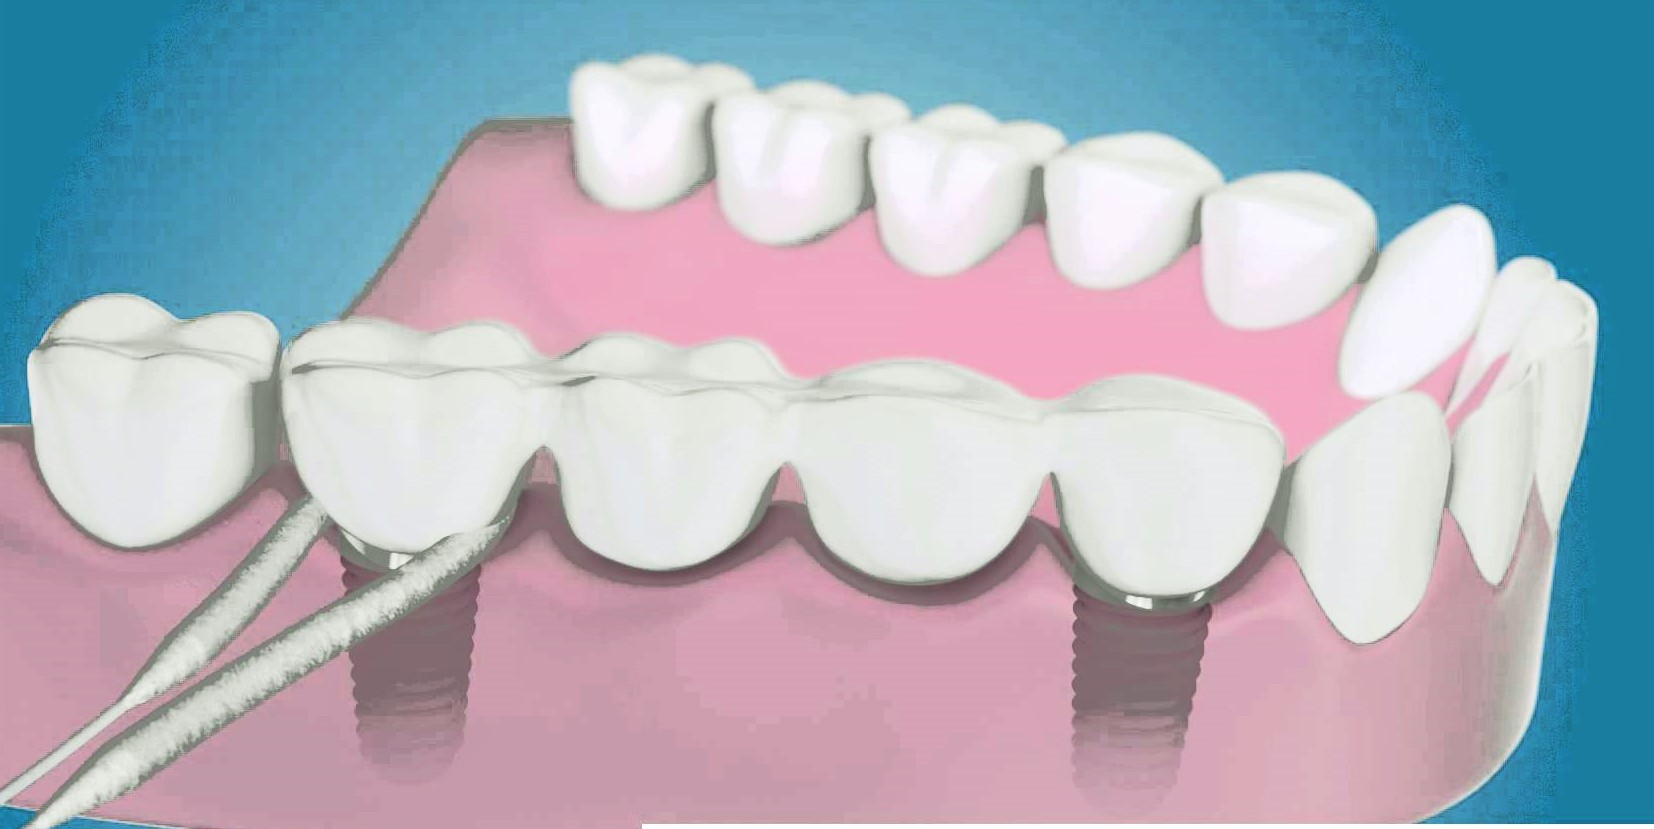 pulizia-impianti-dentista-studio-rosato